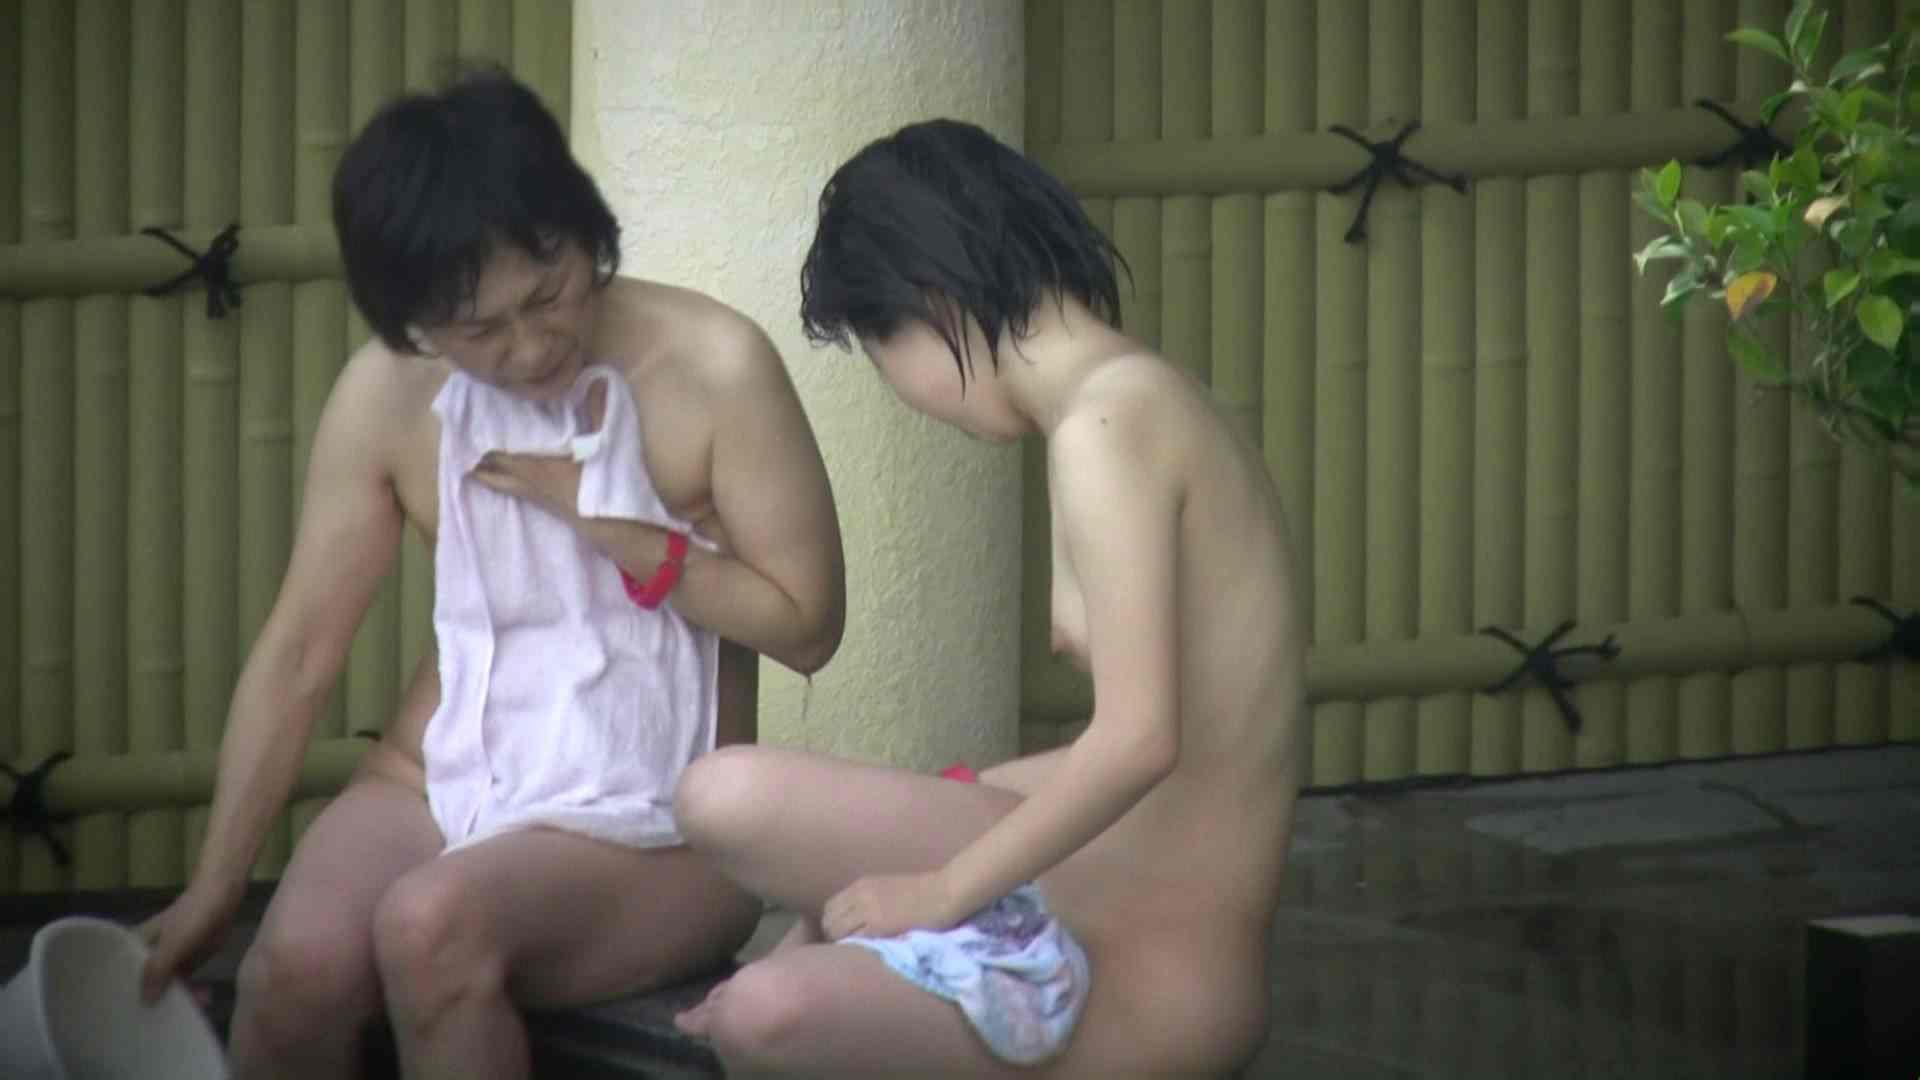 Aquaな露天風呂Vol.06【VIP】 盗撮特撮 盗み撮り動画キャプチャ 11pic 11